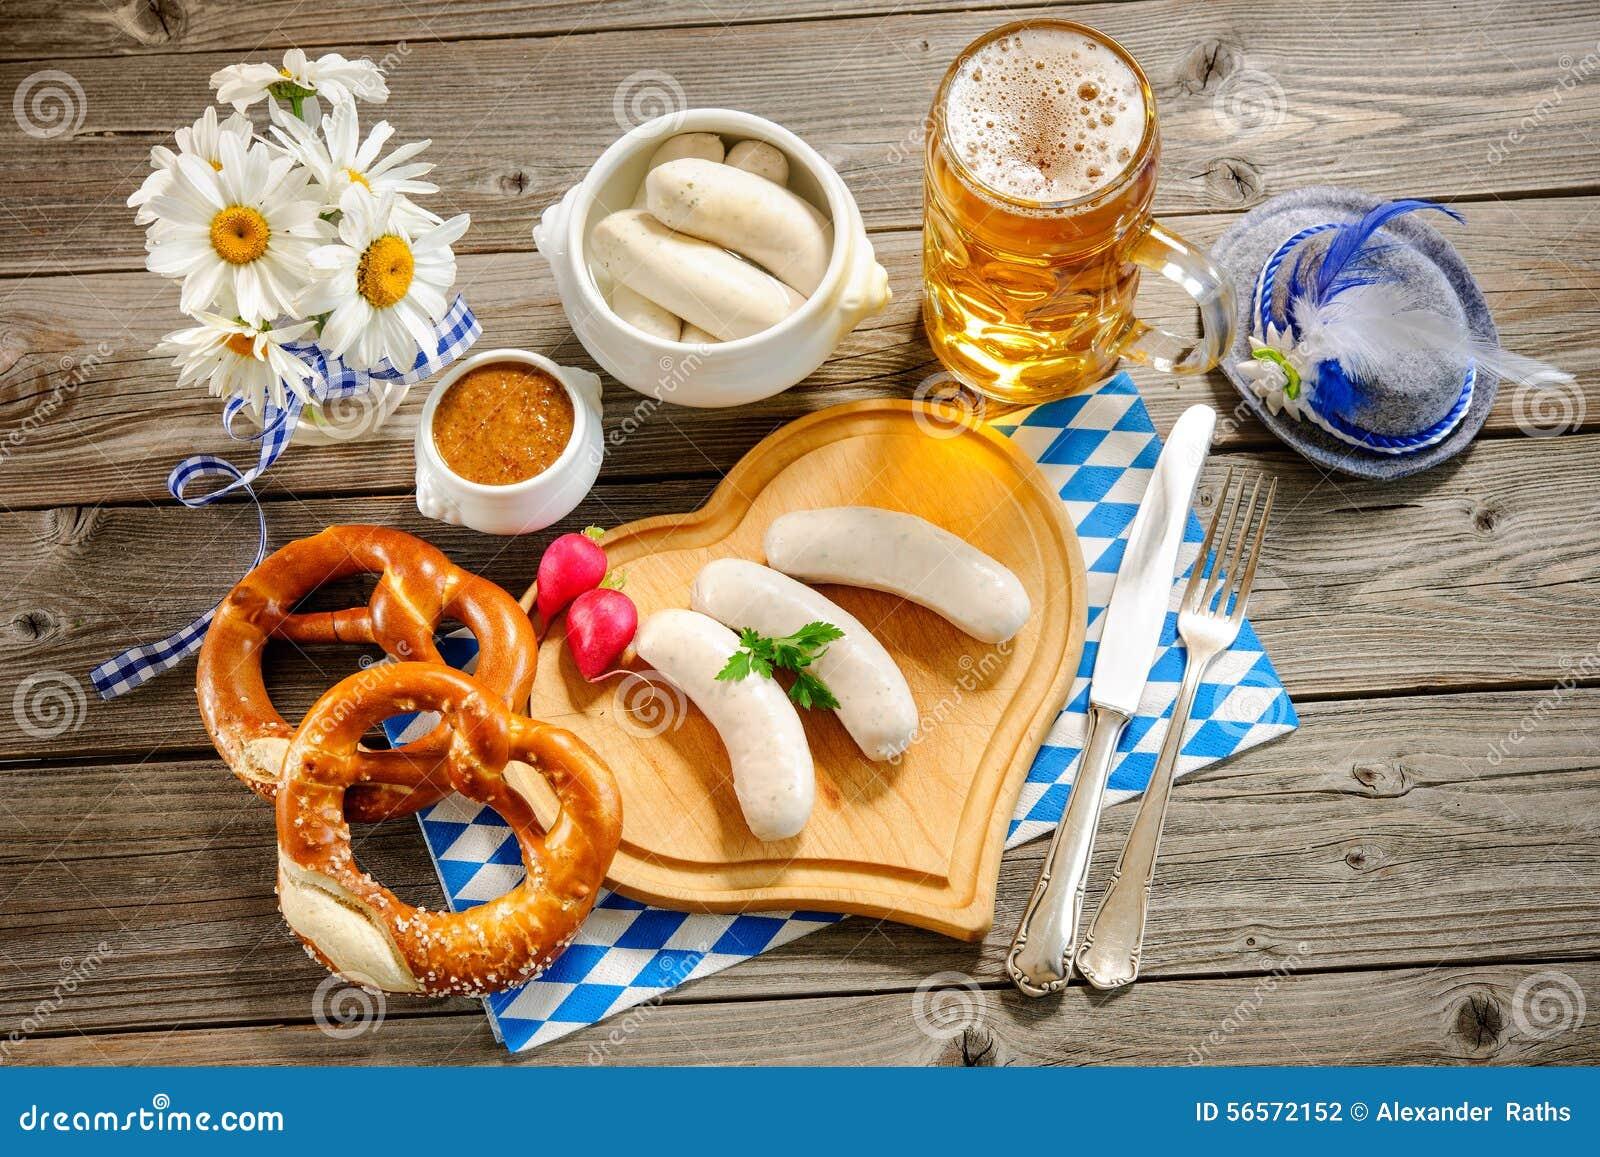 Download Βαυαρικό λουκάνικο μοσχαρίσιων κρεάτων Στοκ Εικόνες - εικόνα από κουζίνα, μαχαιροπήρουνα: 56572152